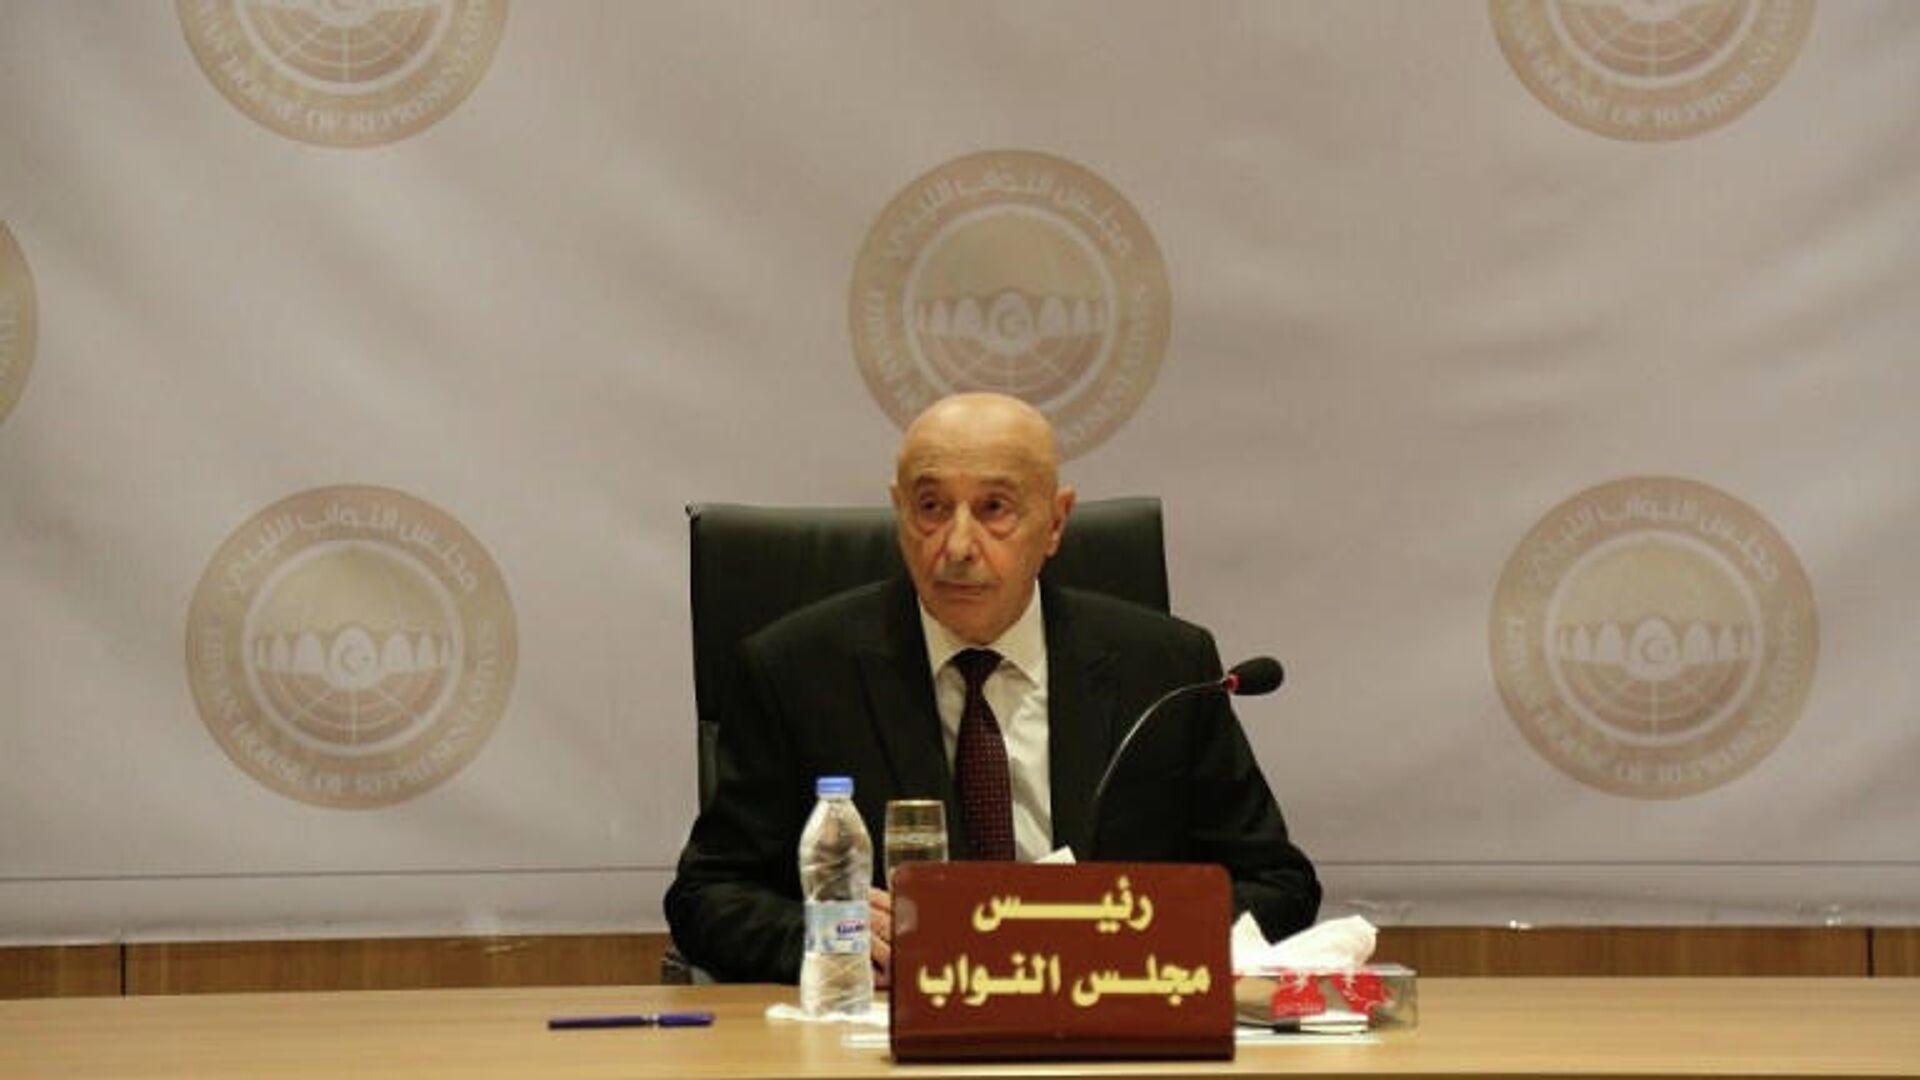 Cпикер парламента Ливии Агиля Салех - РИА Новости, 1920, 10.03.2021